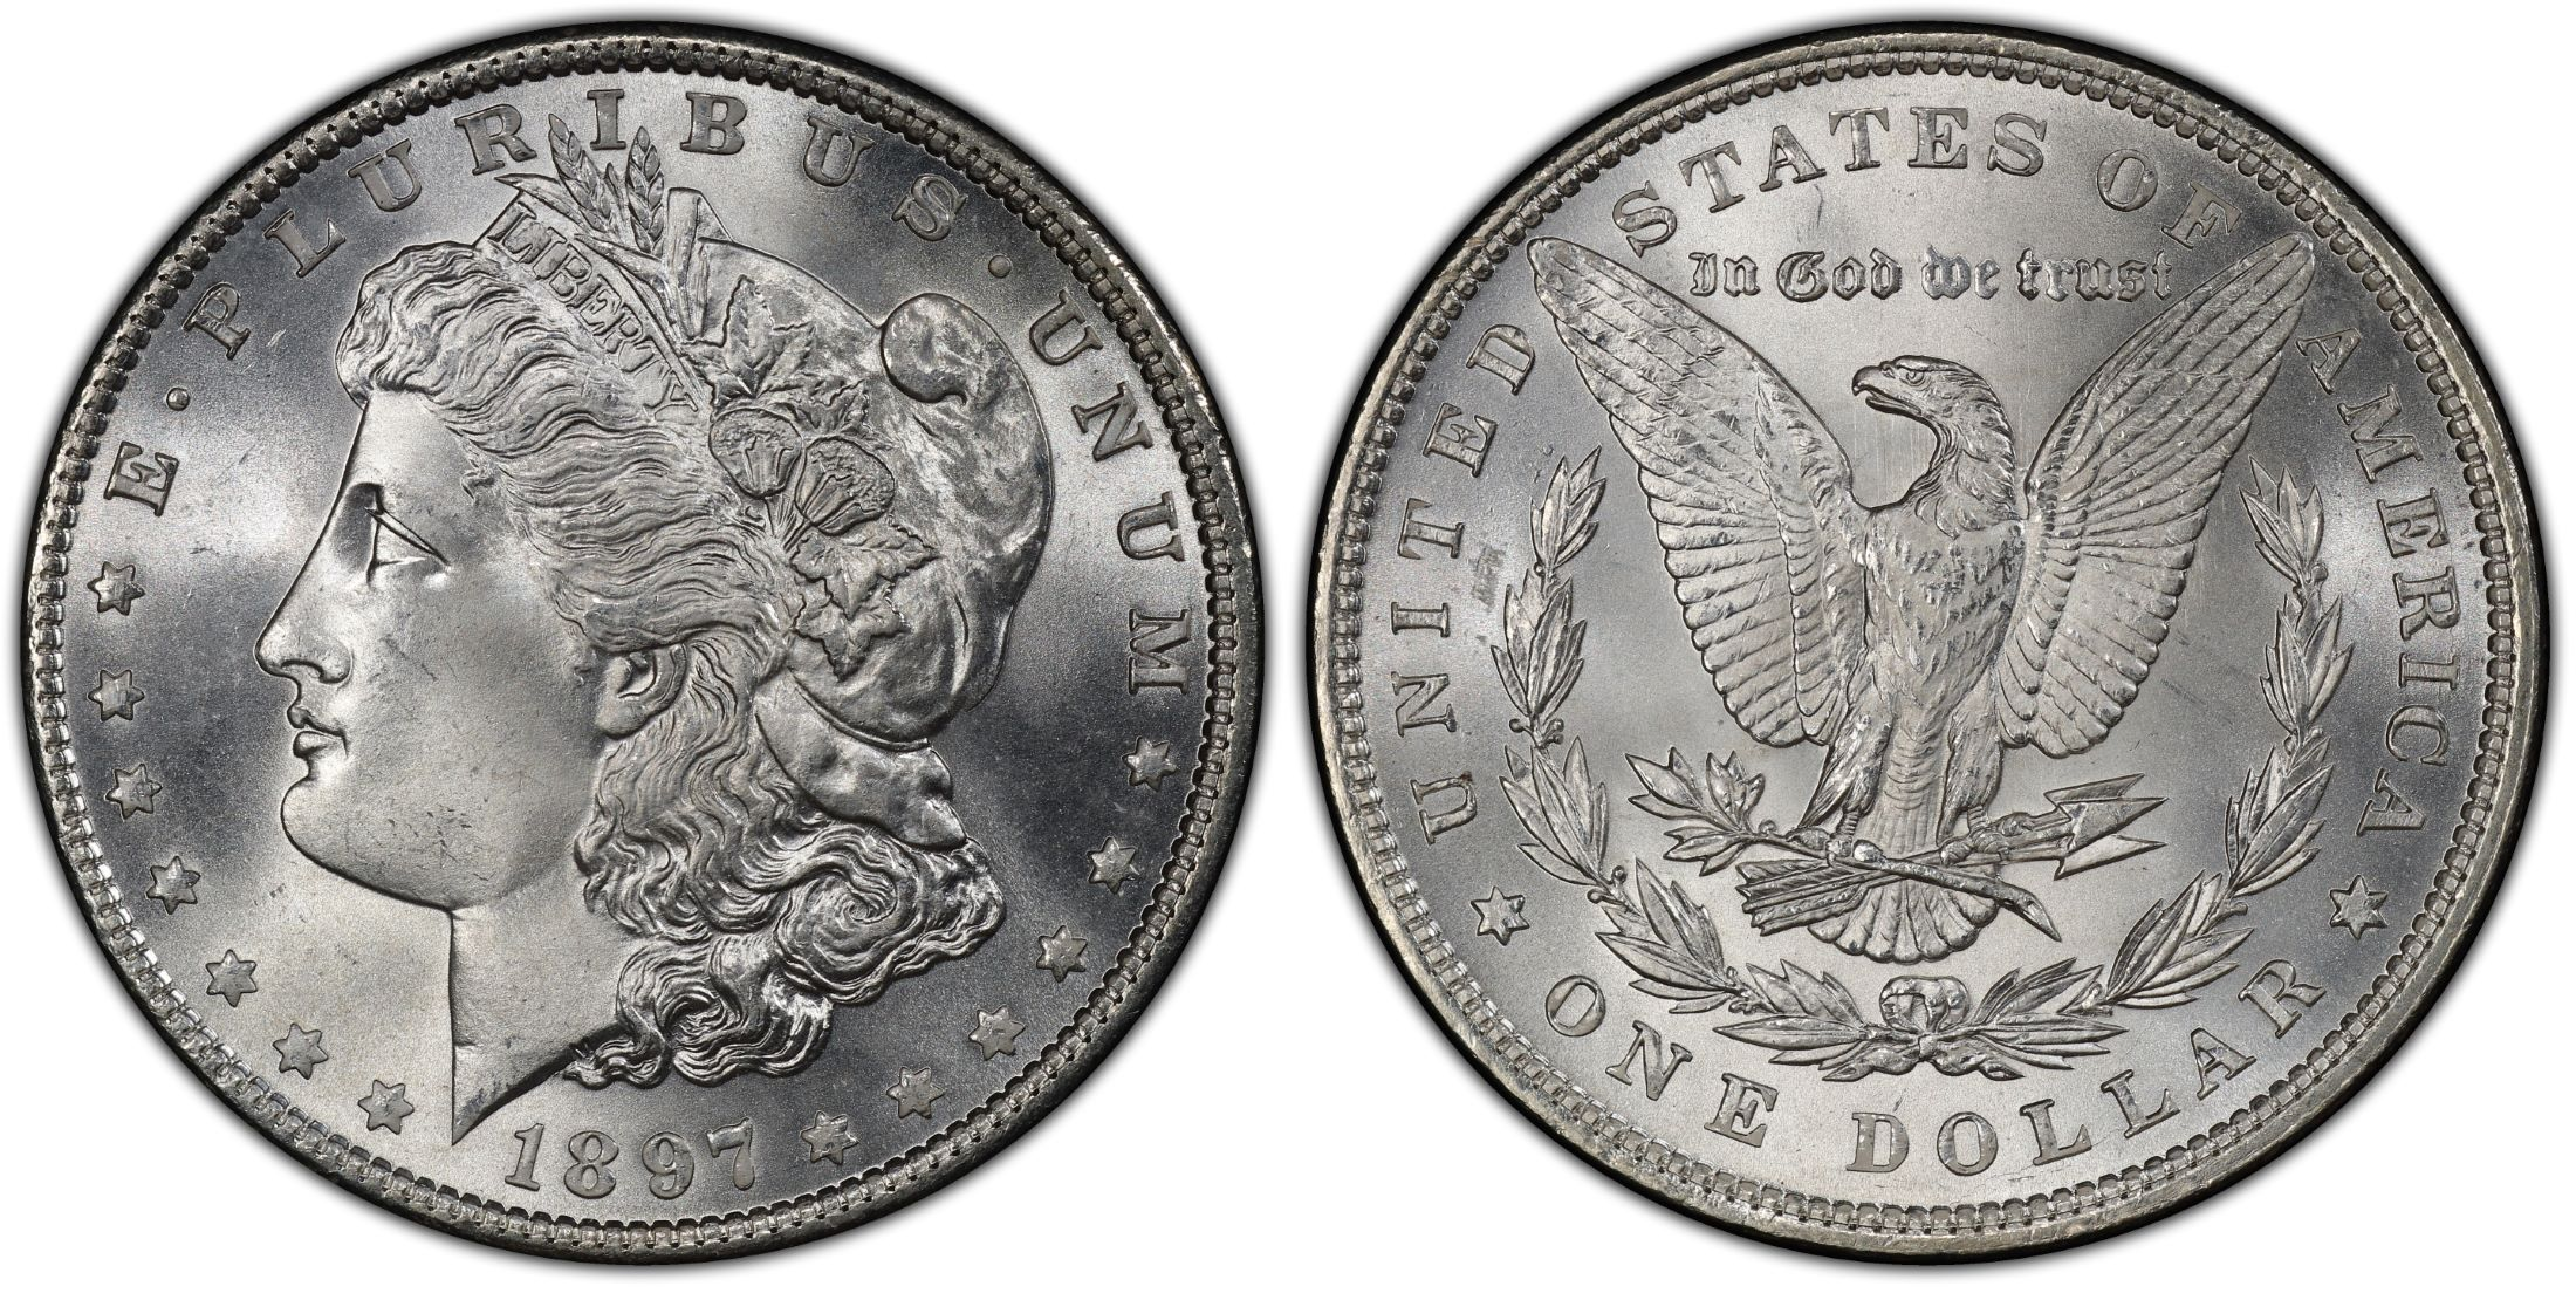 PCGS 1897  MS64 Morgan Dollars